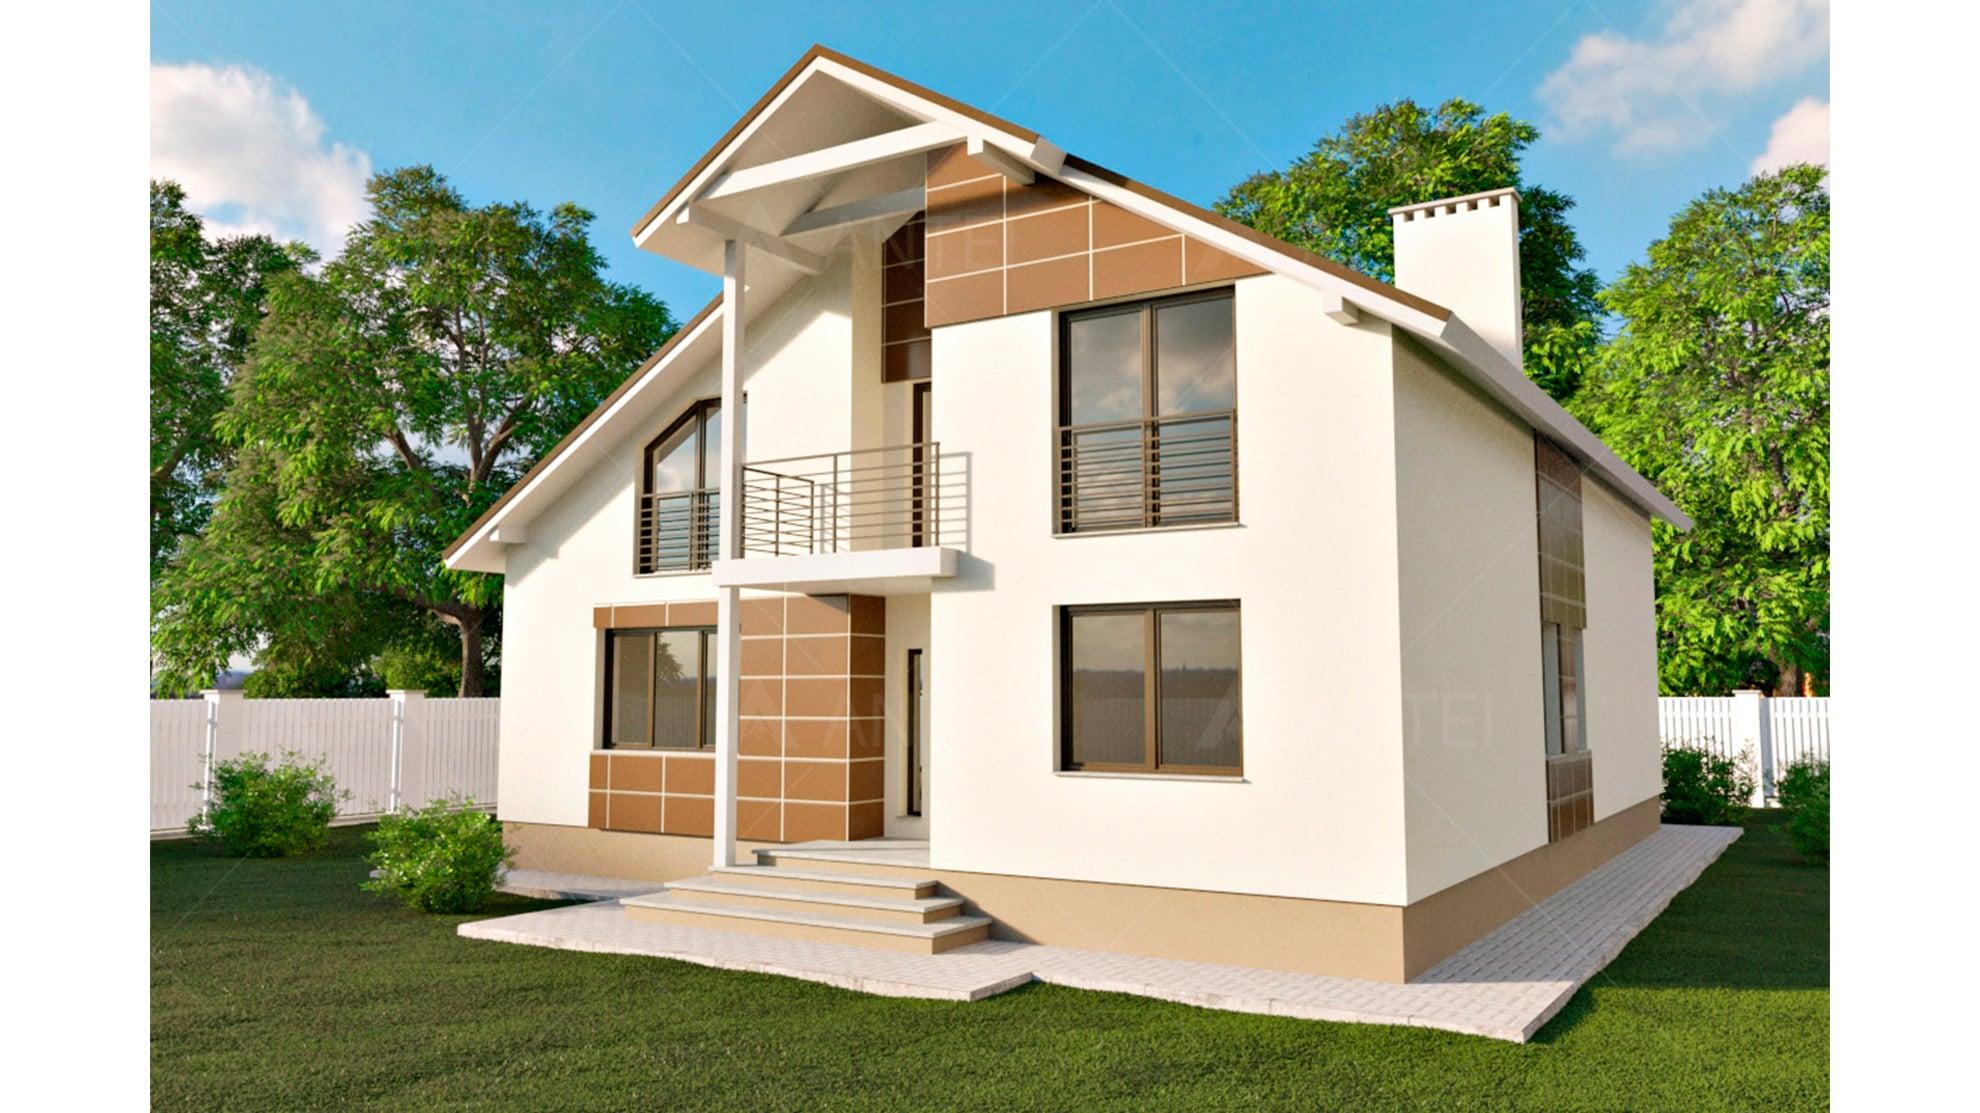 Проект мансардного дома с гаражом и балконом «КМ-59» - фото №2